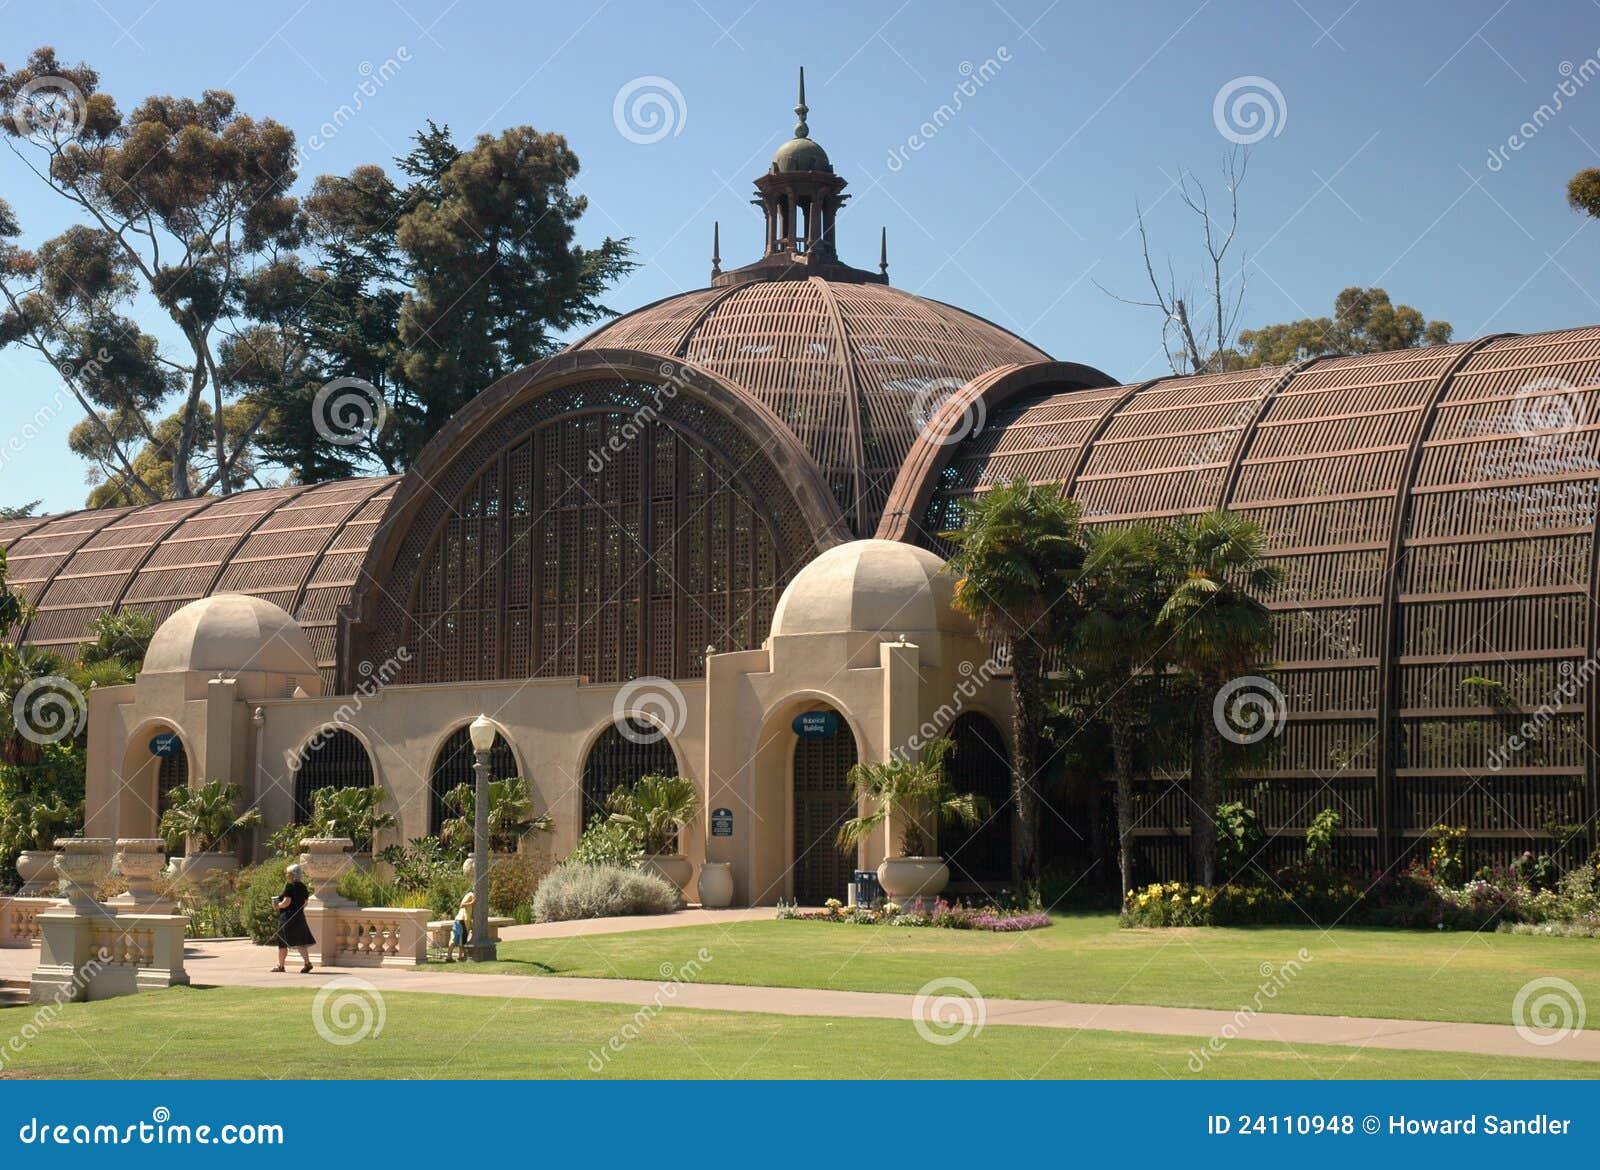 Botanical Building Balboa Park San Diego Stock Photo